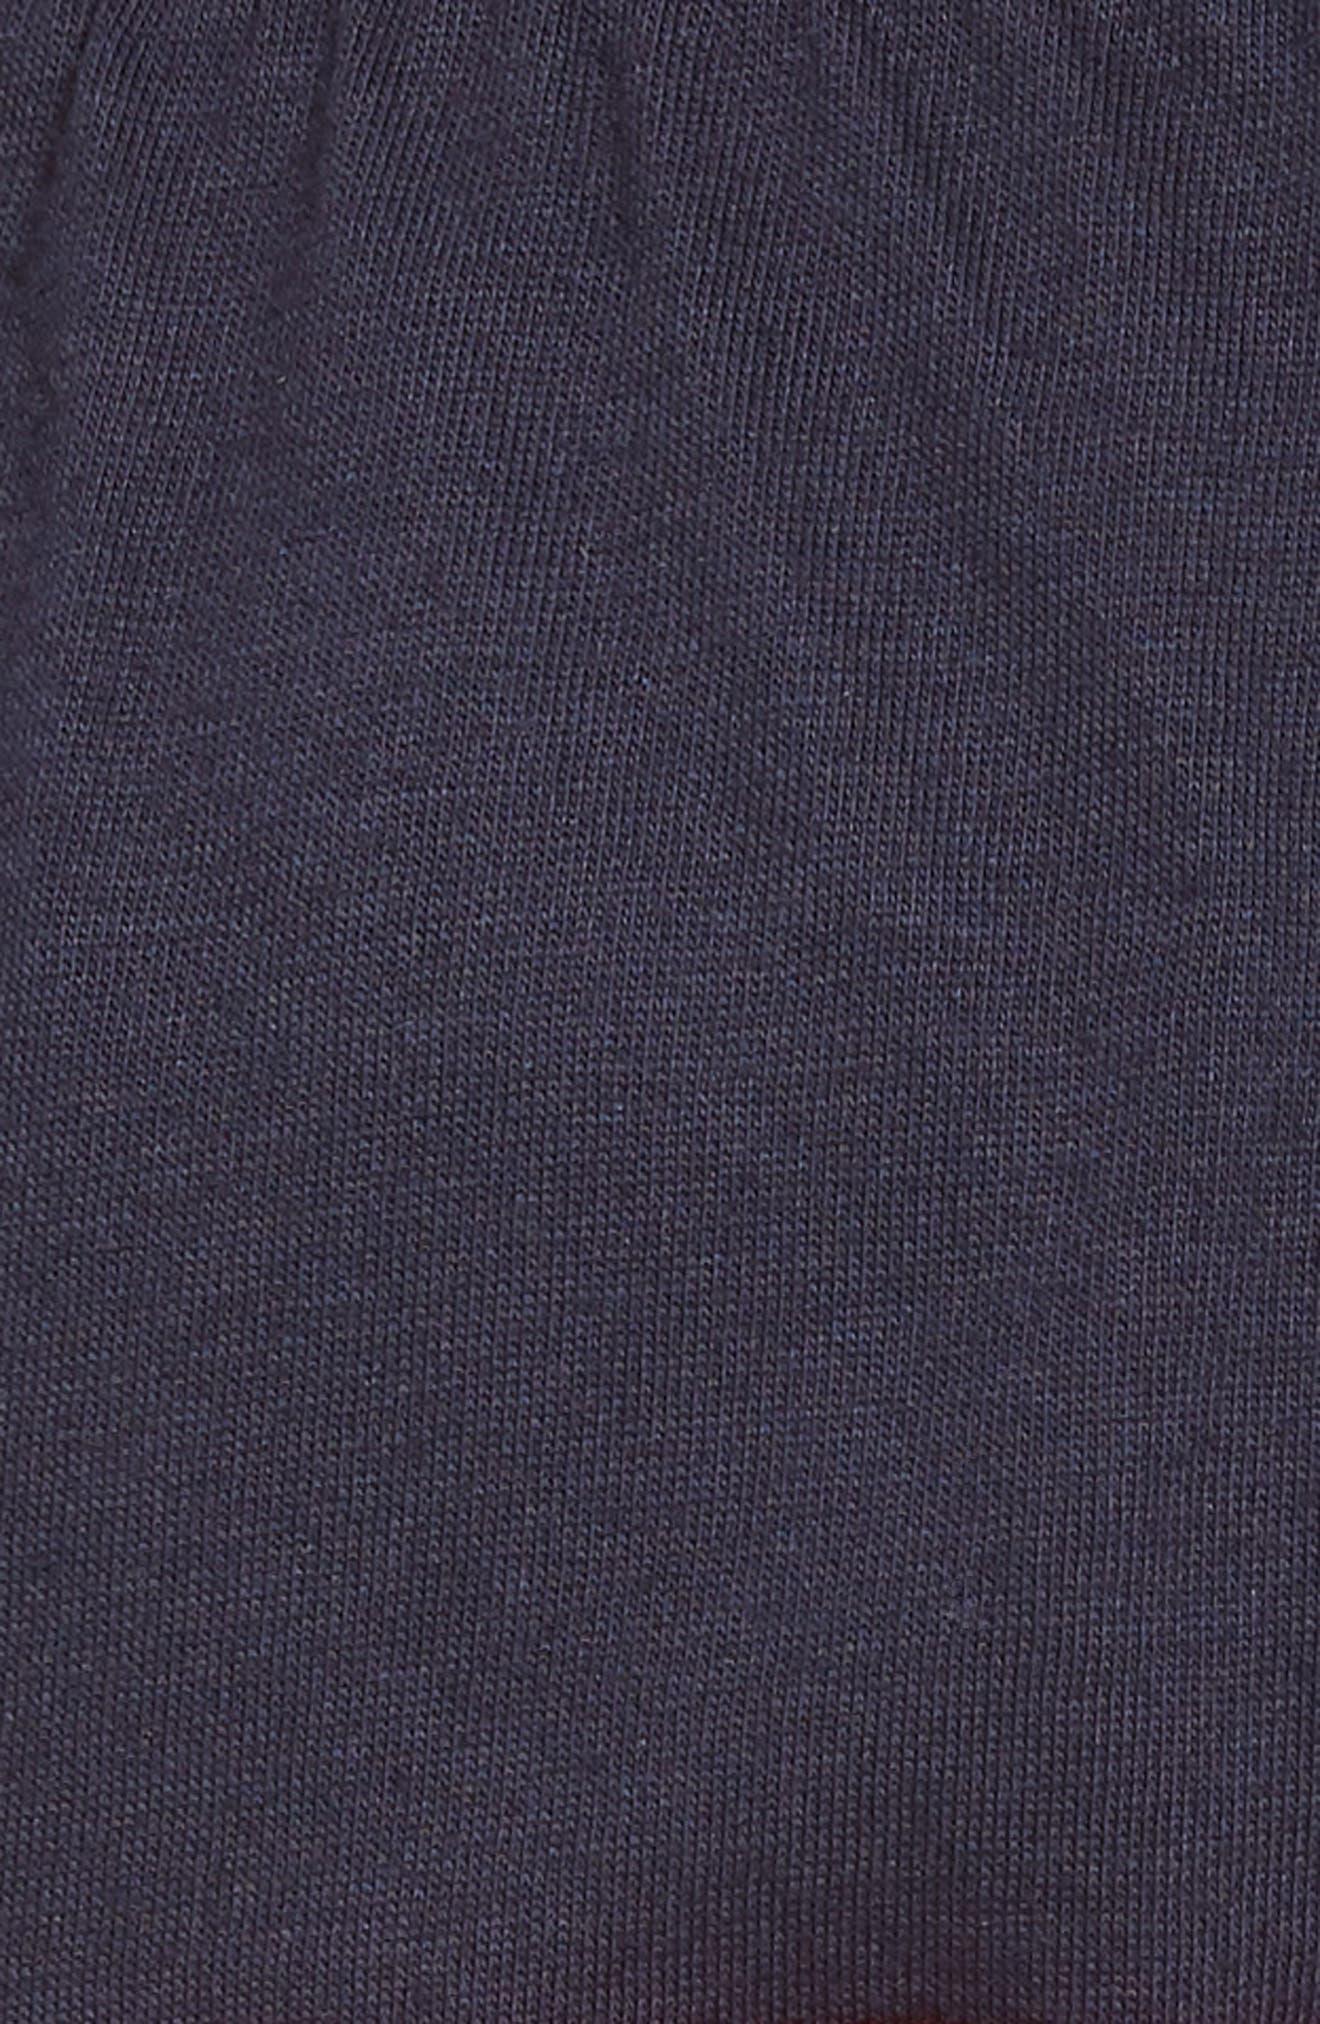 Colorblock Knit Boxers,                             Alternate thumbnail 5, color,